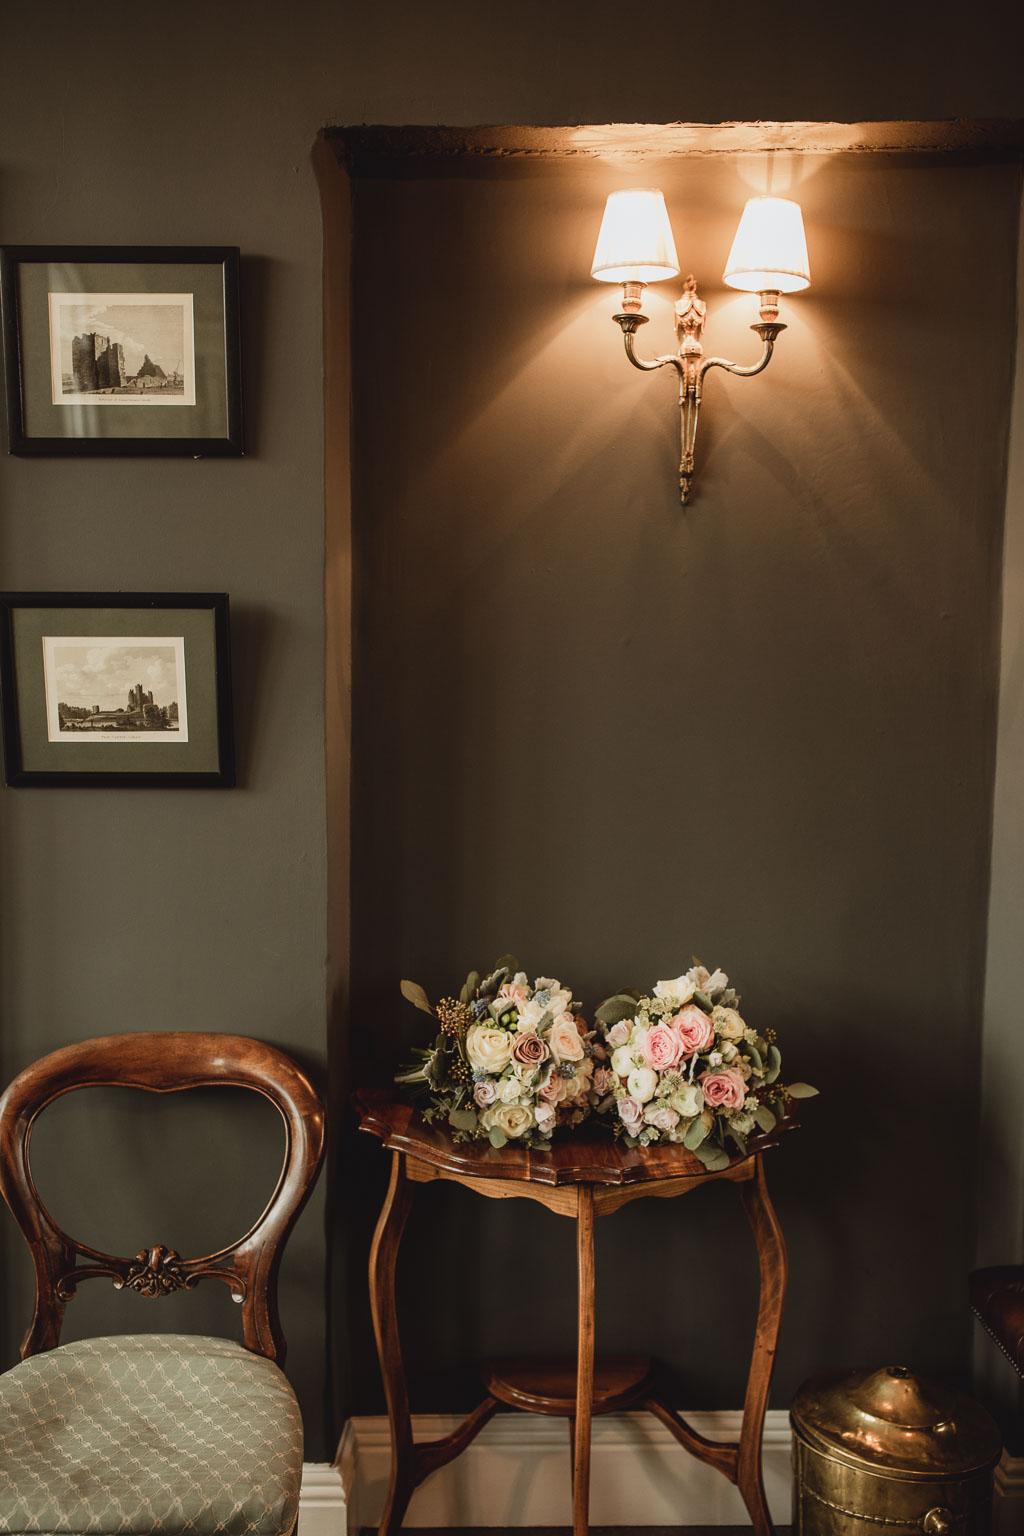 wedding flowers by VP flowers in clonabreany house